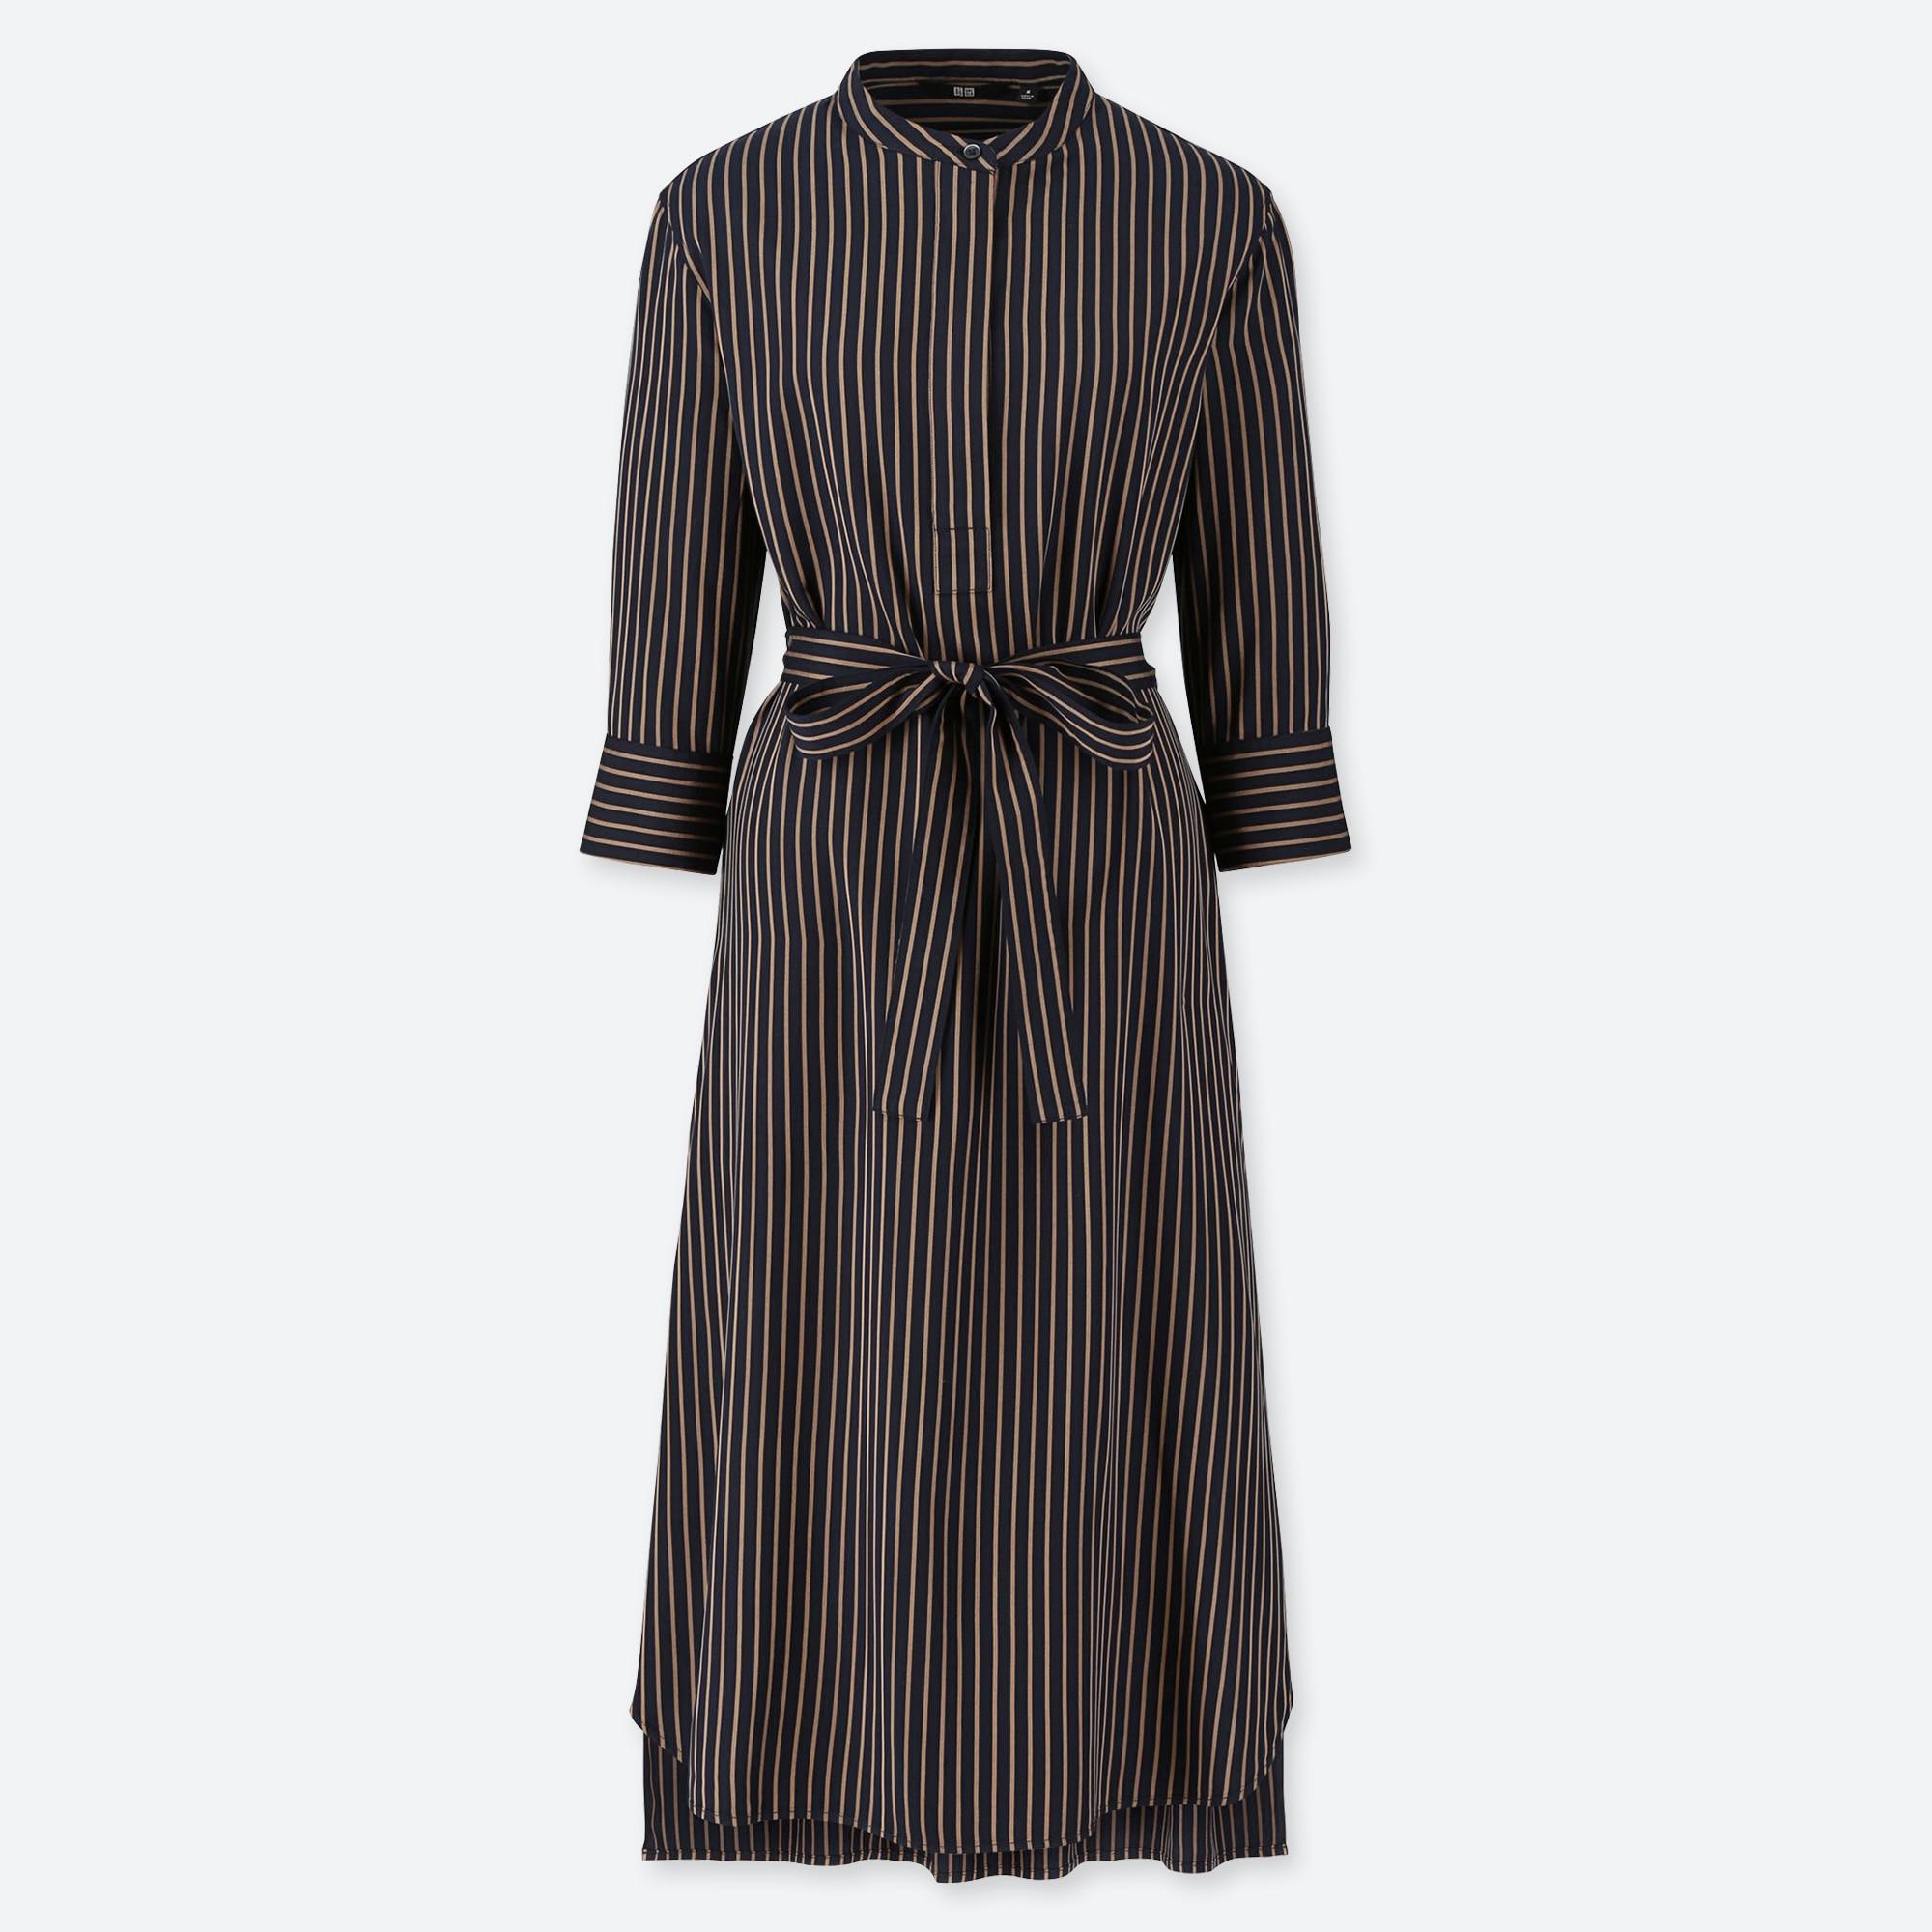 WOMEN RAYON 3/4 SLEEVE STRIPED DRESS